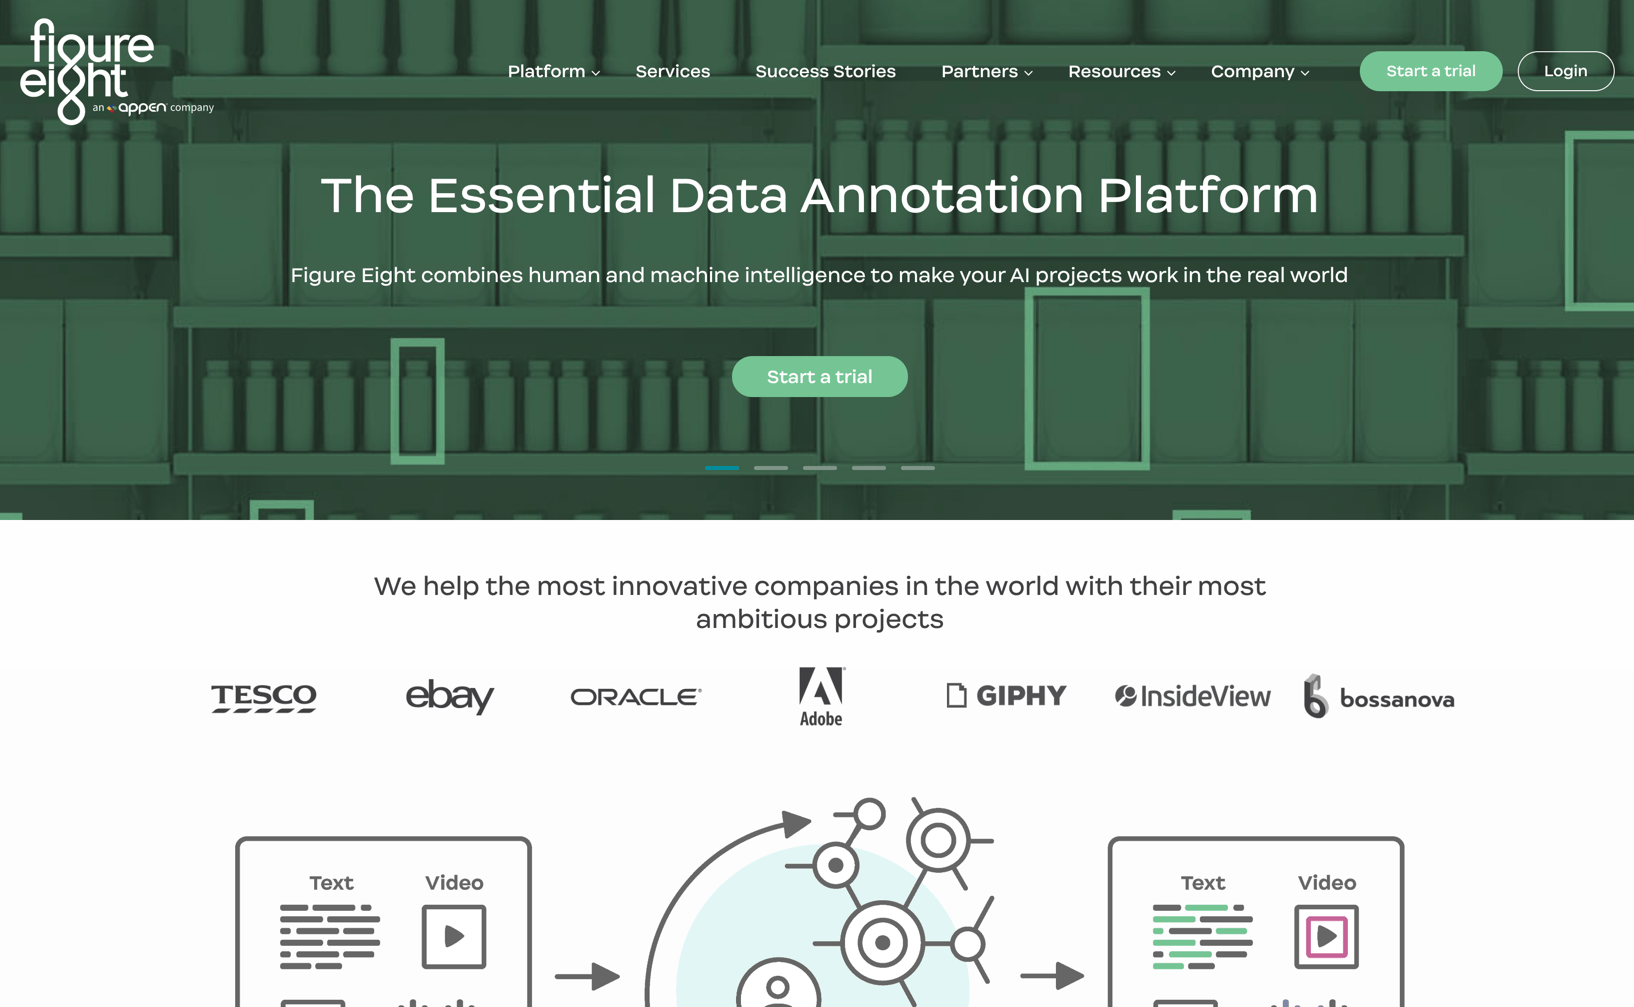 figure eight home page screenshot